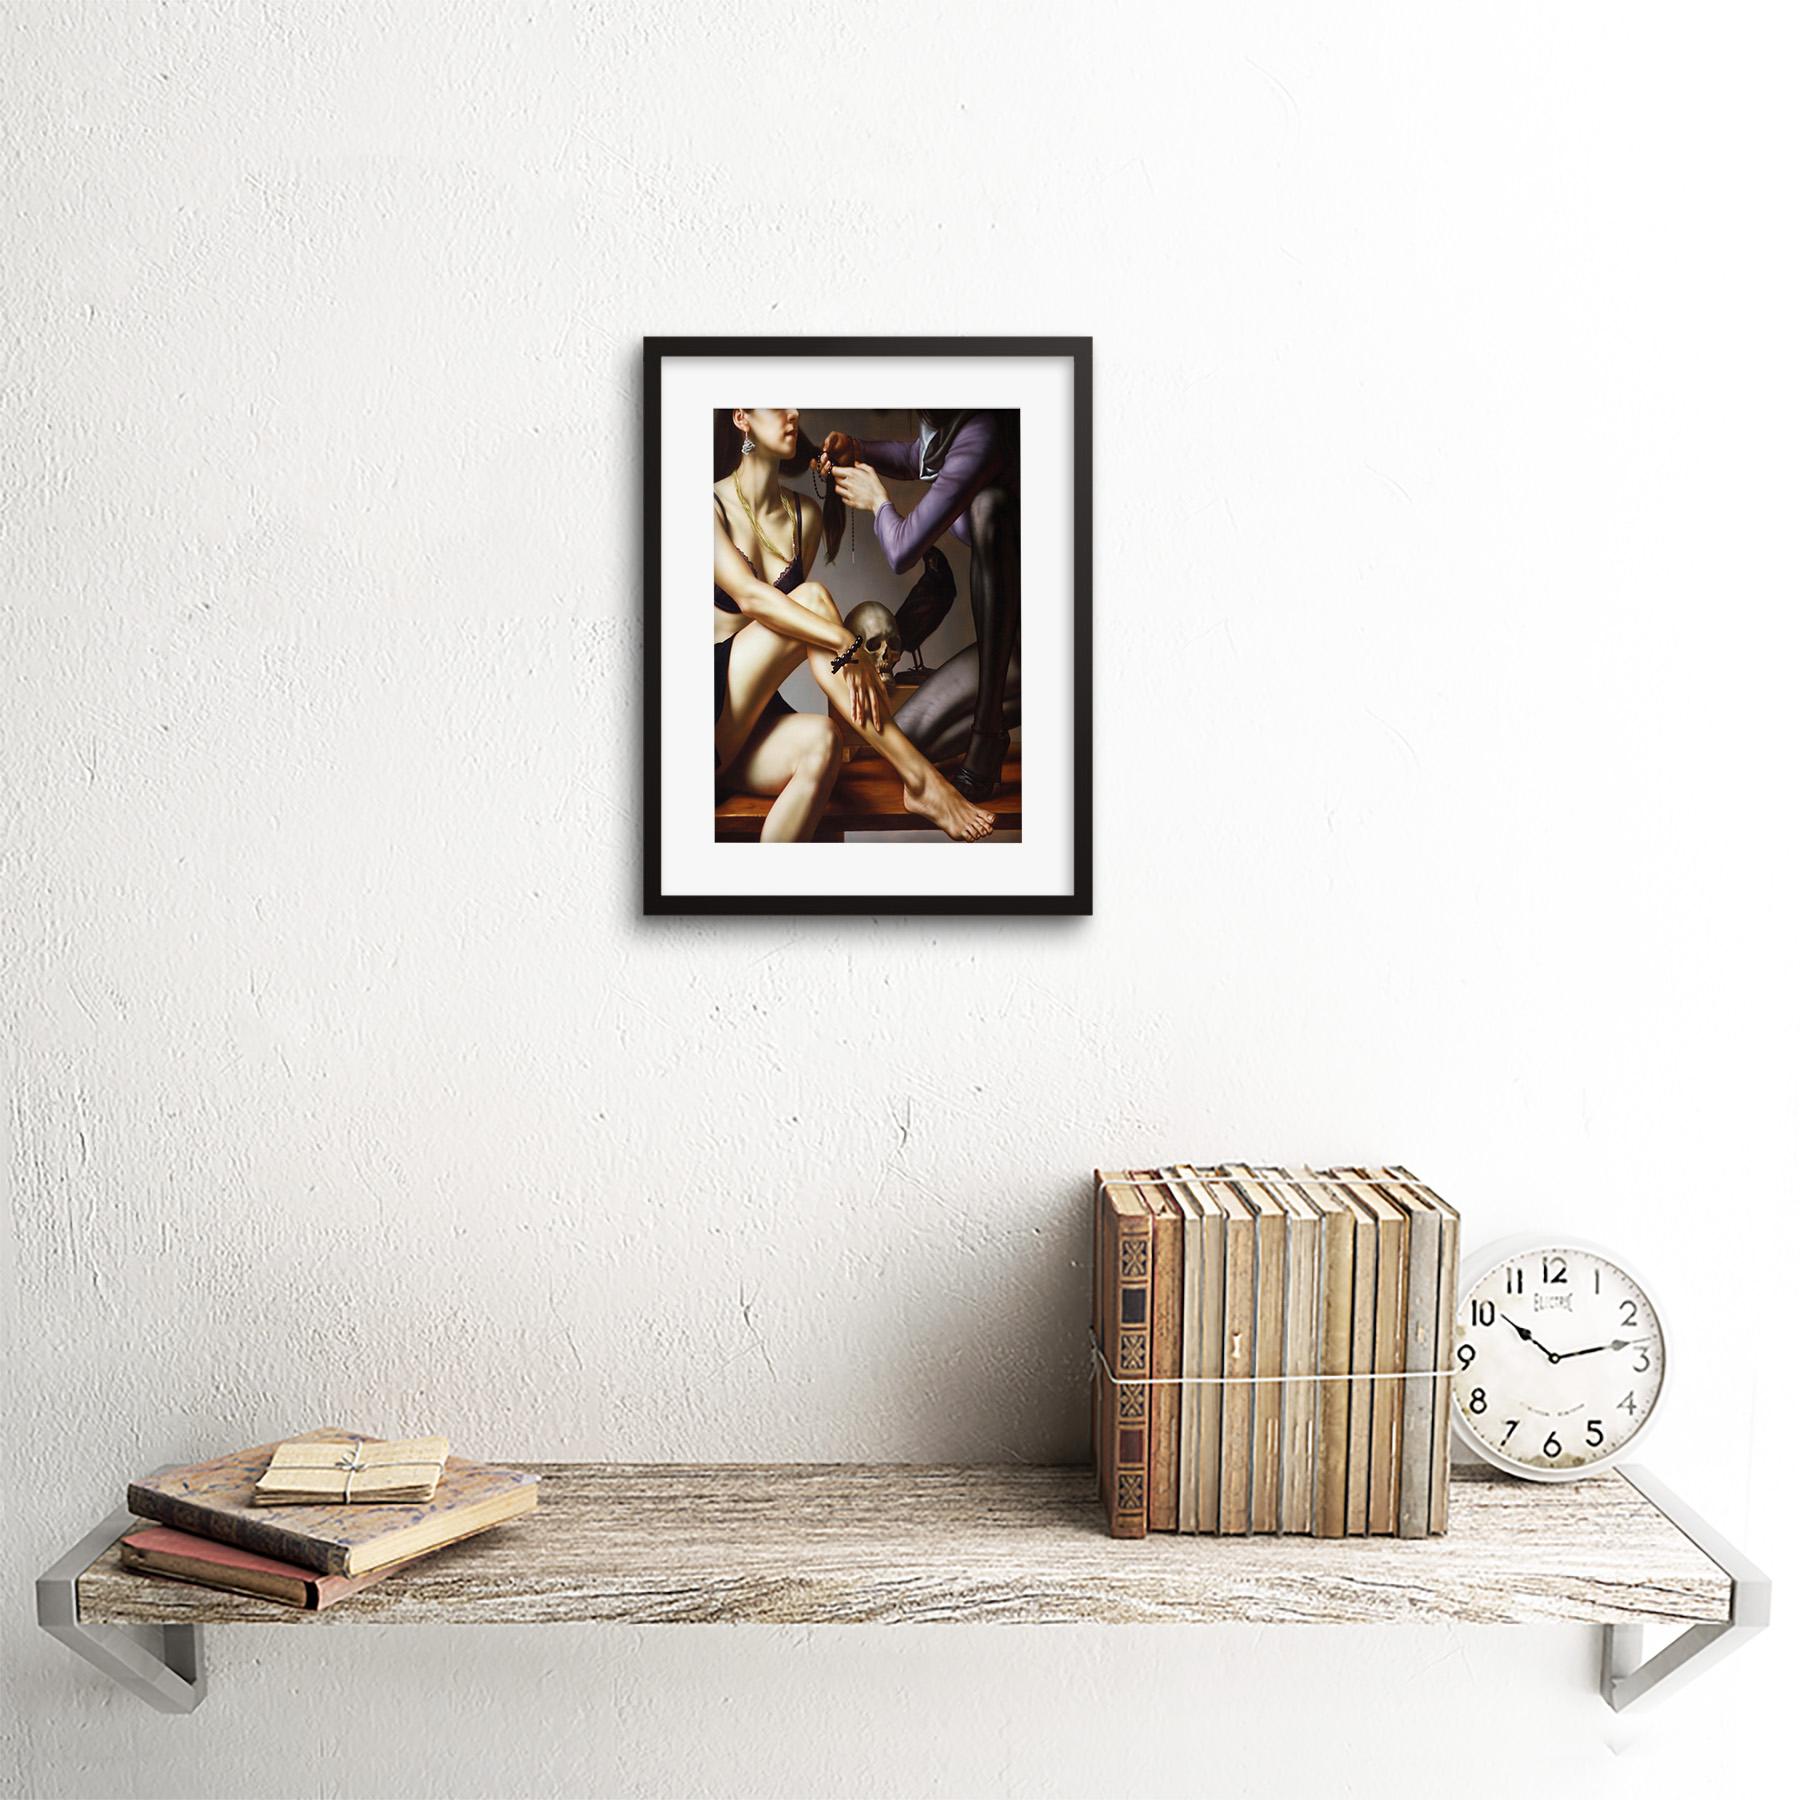 Painting-Balcar-Entering-Renaissance-Framed-Art-Print-9x7-Inch 縮圖 3